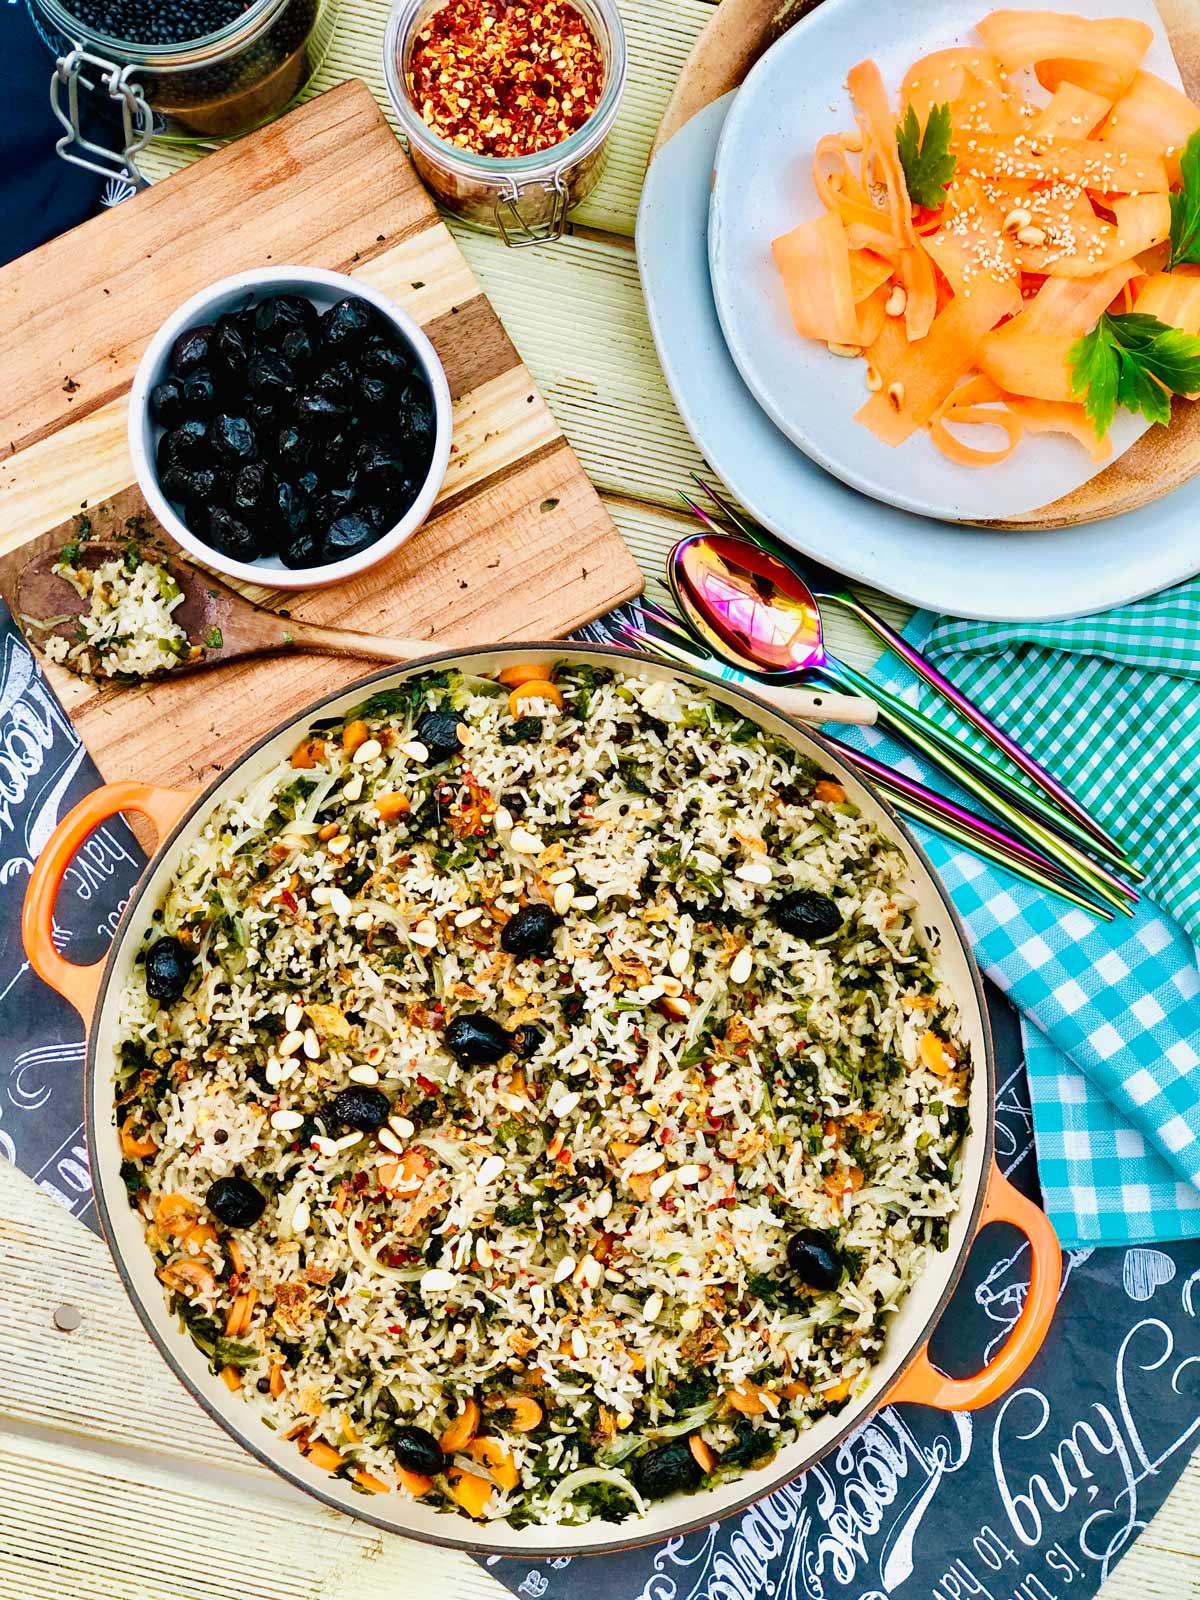 Pilau rice with wild garlic and stinging nettles